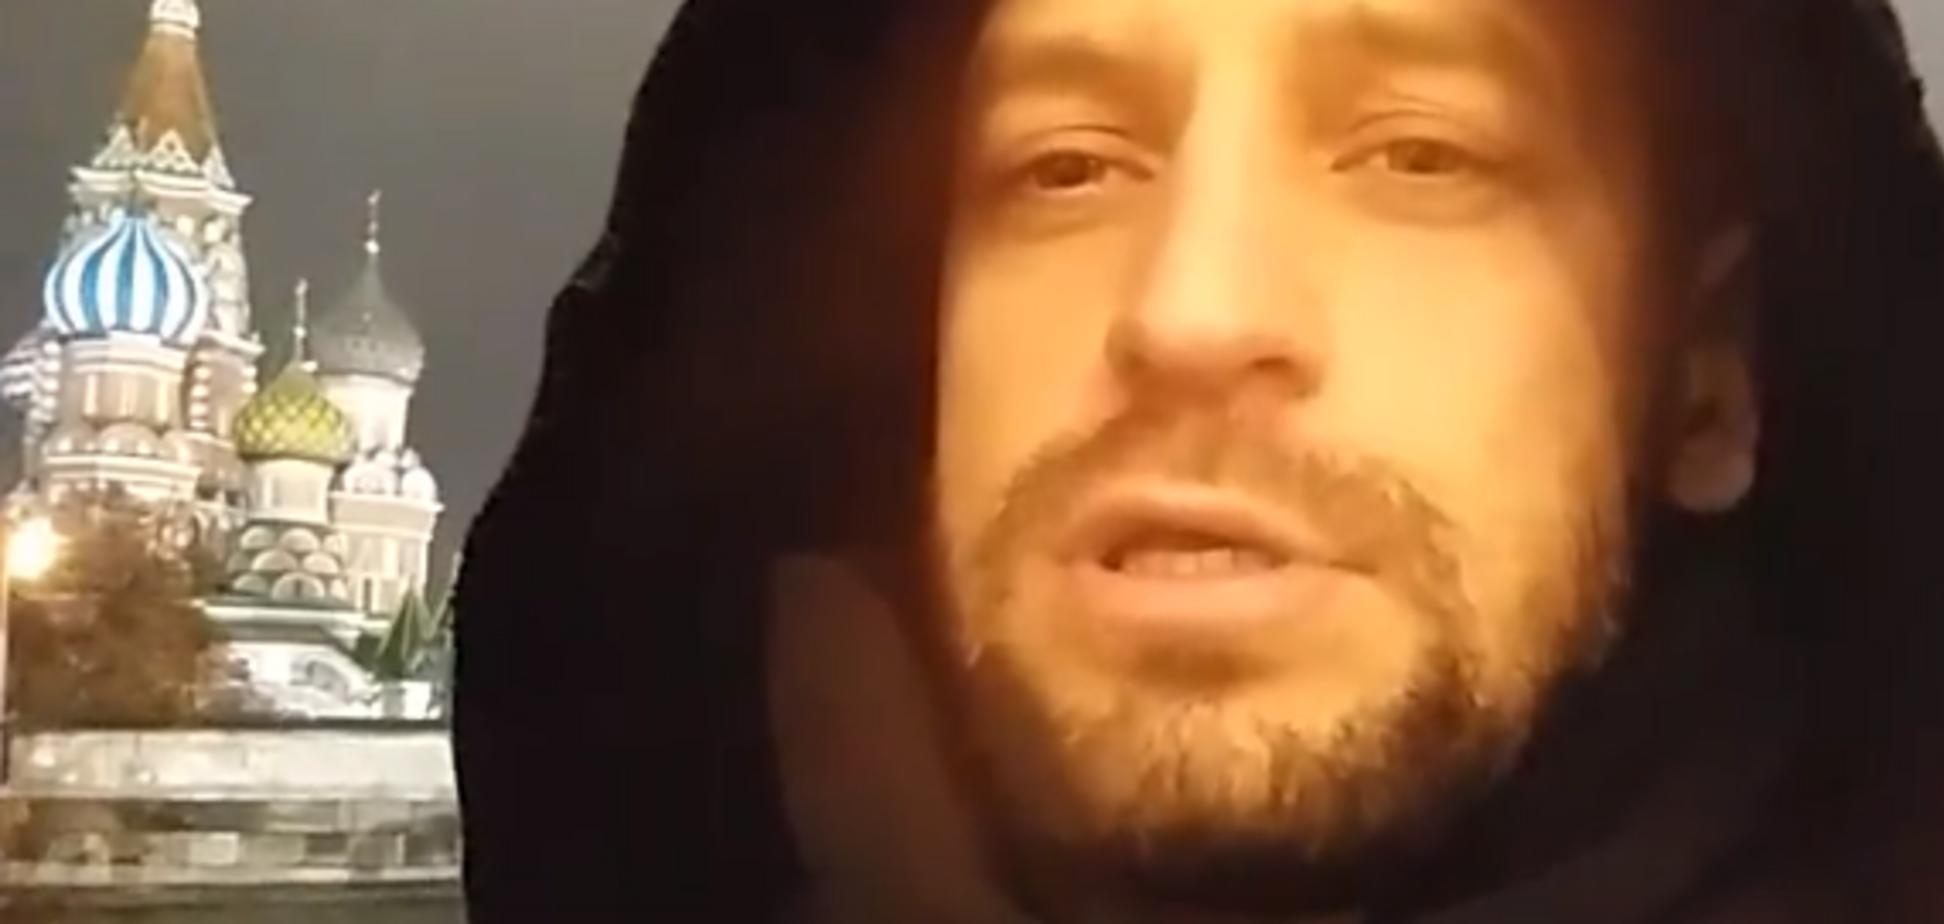 'Немає сенсу ставати трупом': ватажок батальйону 'Ангел' втік із Донбасу